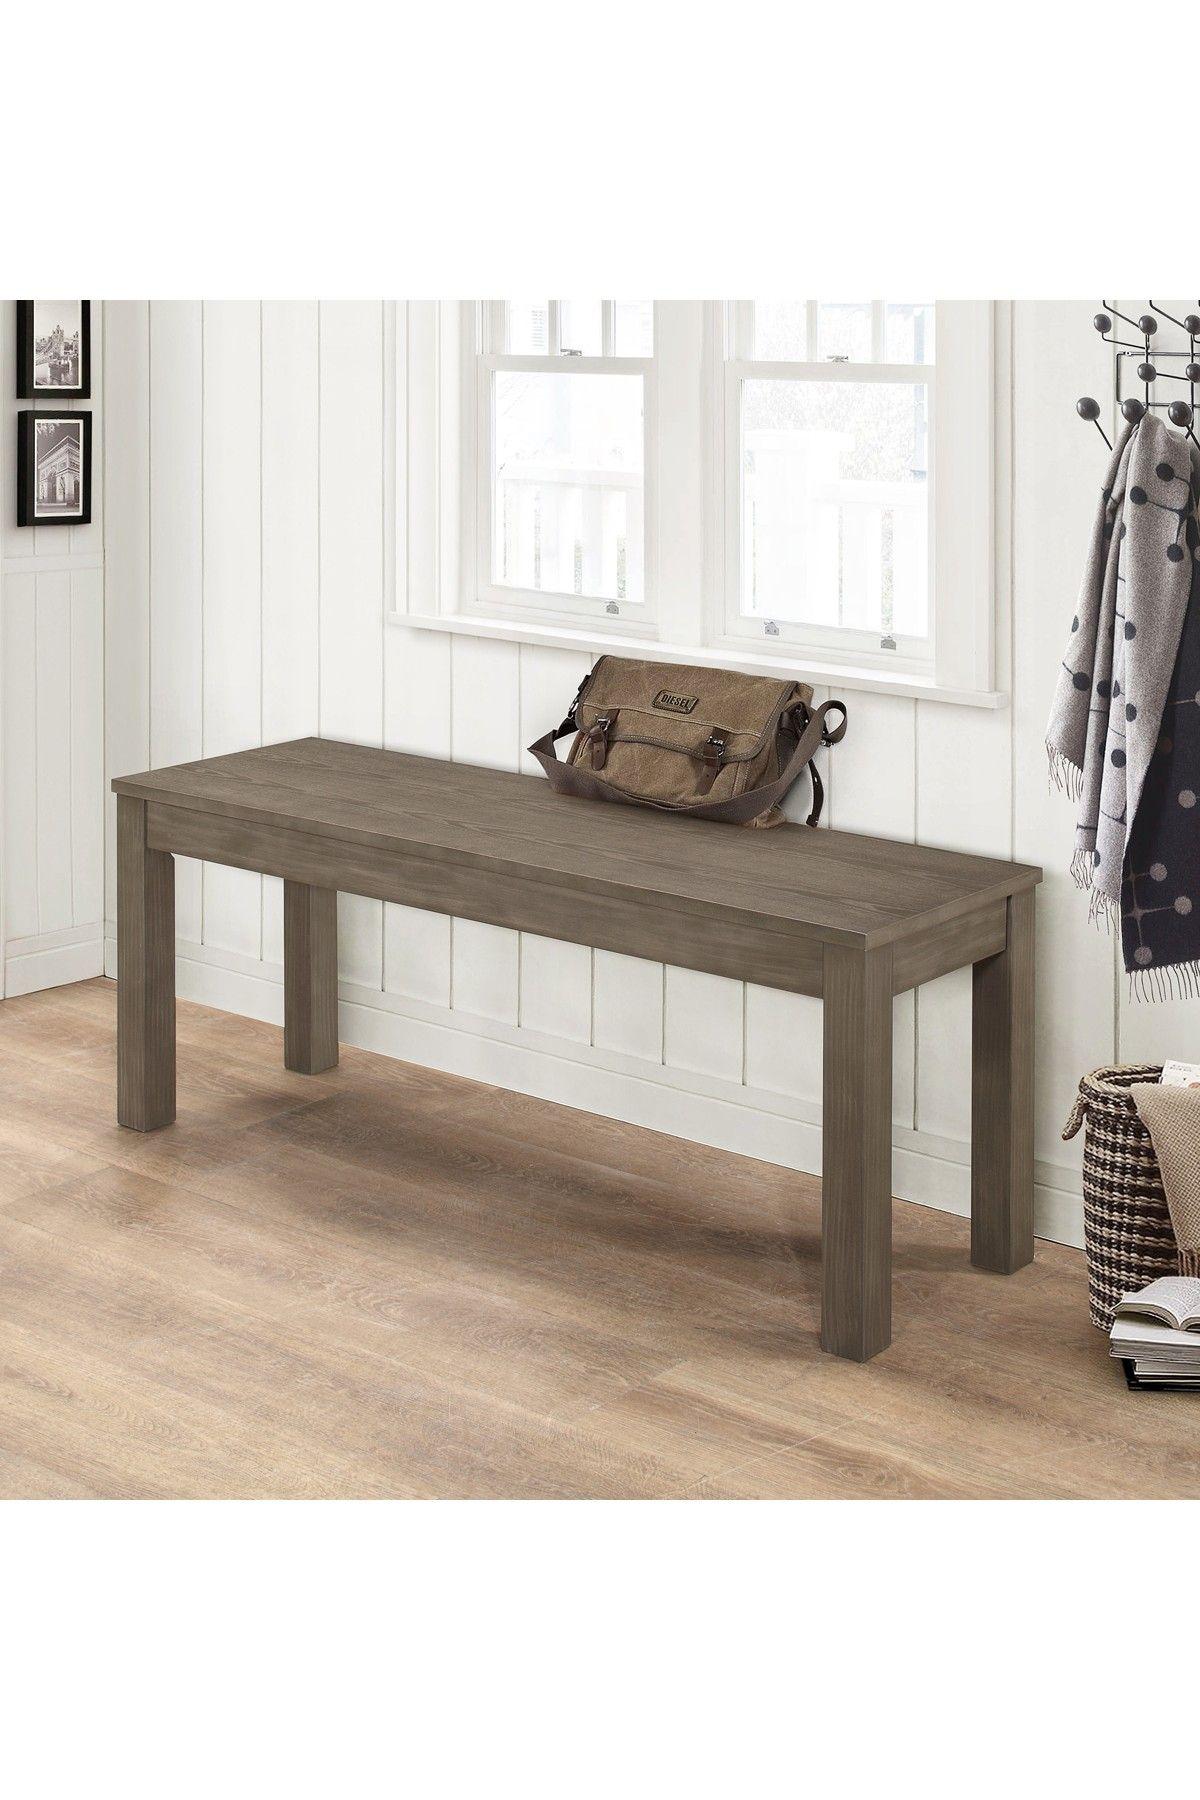 "Walker Edison Furniture pany 48"" Aged Grey Homestead Simple Wood"